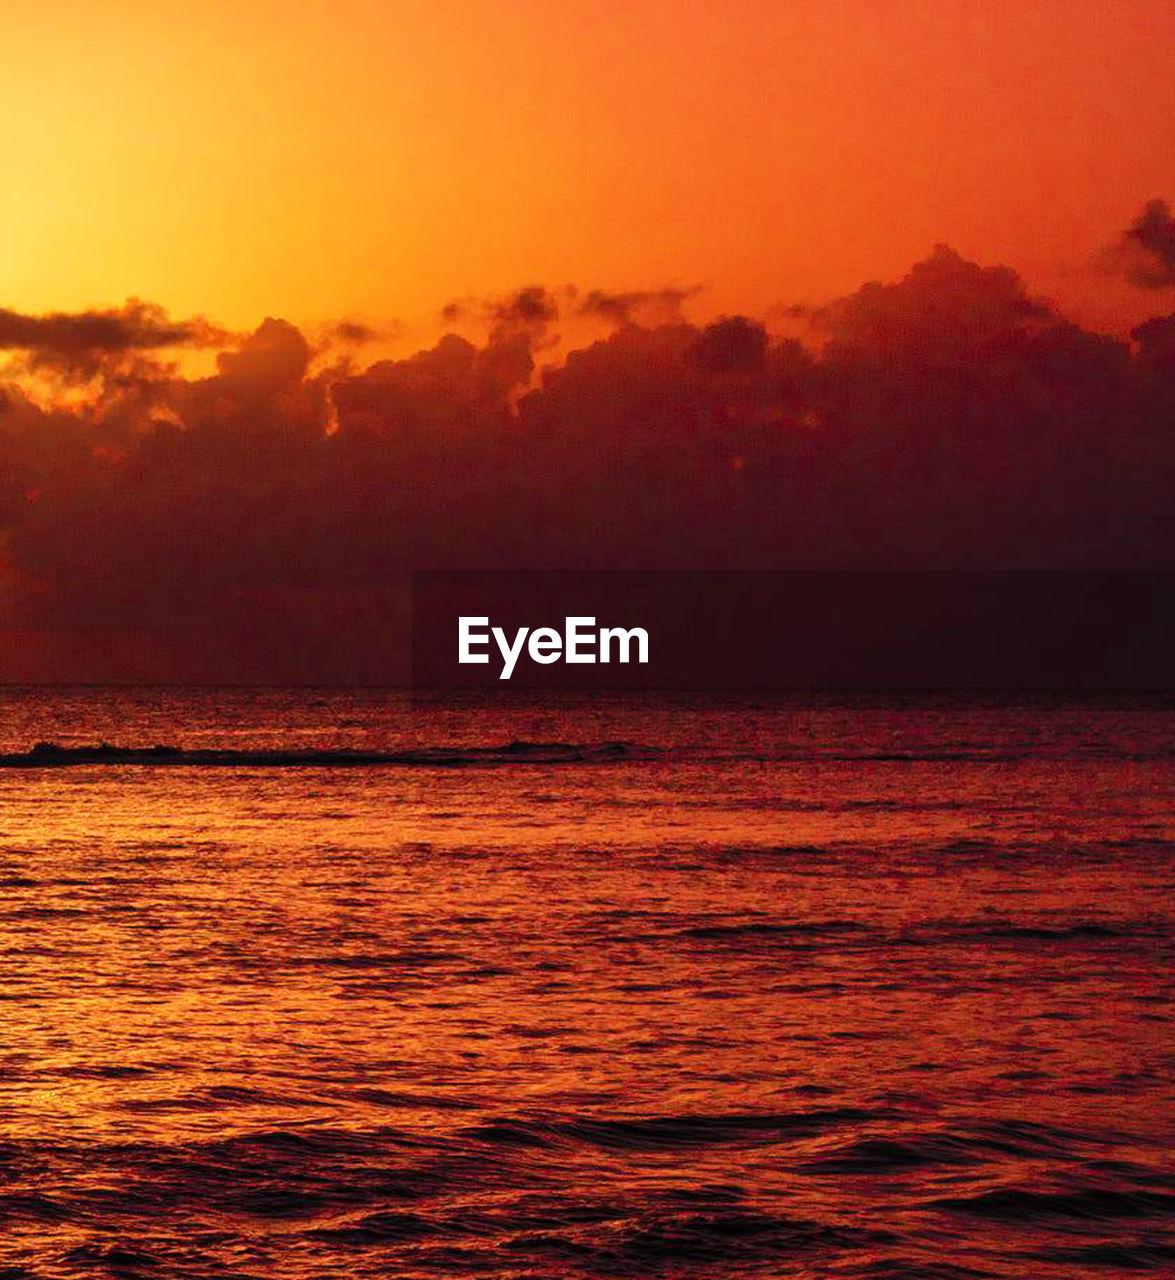 water, sea, sunset, sky, beauty in nature, scenics - nature, tranquility, cloud - sky, nature, tranquil scene, no people, orange color, horizon over water, horizon, idyllic, dramatic sky, rippled, outdoors, seascape